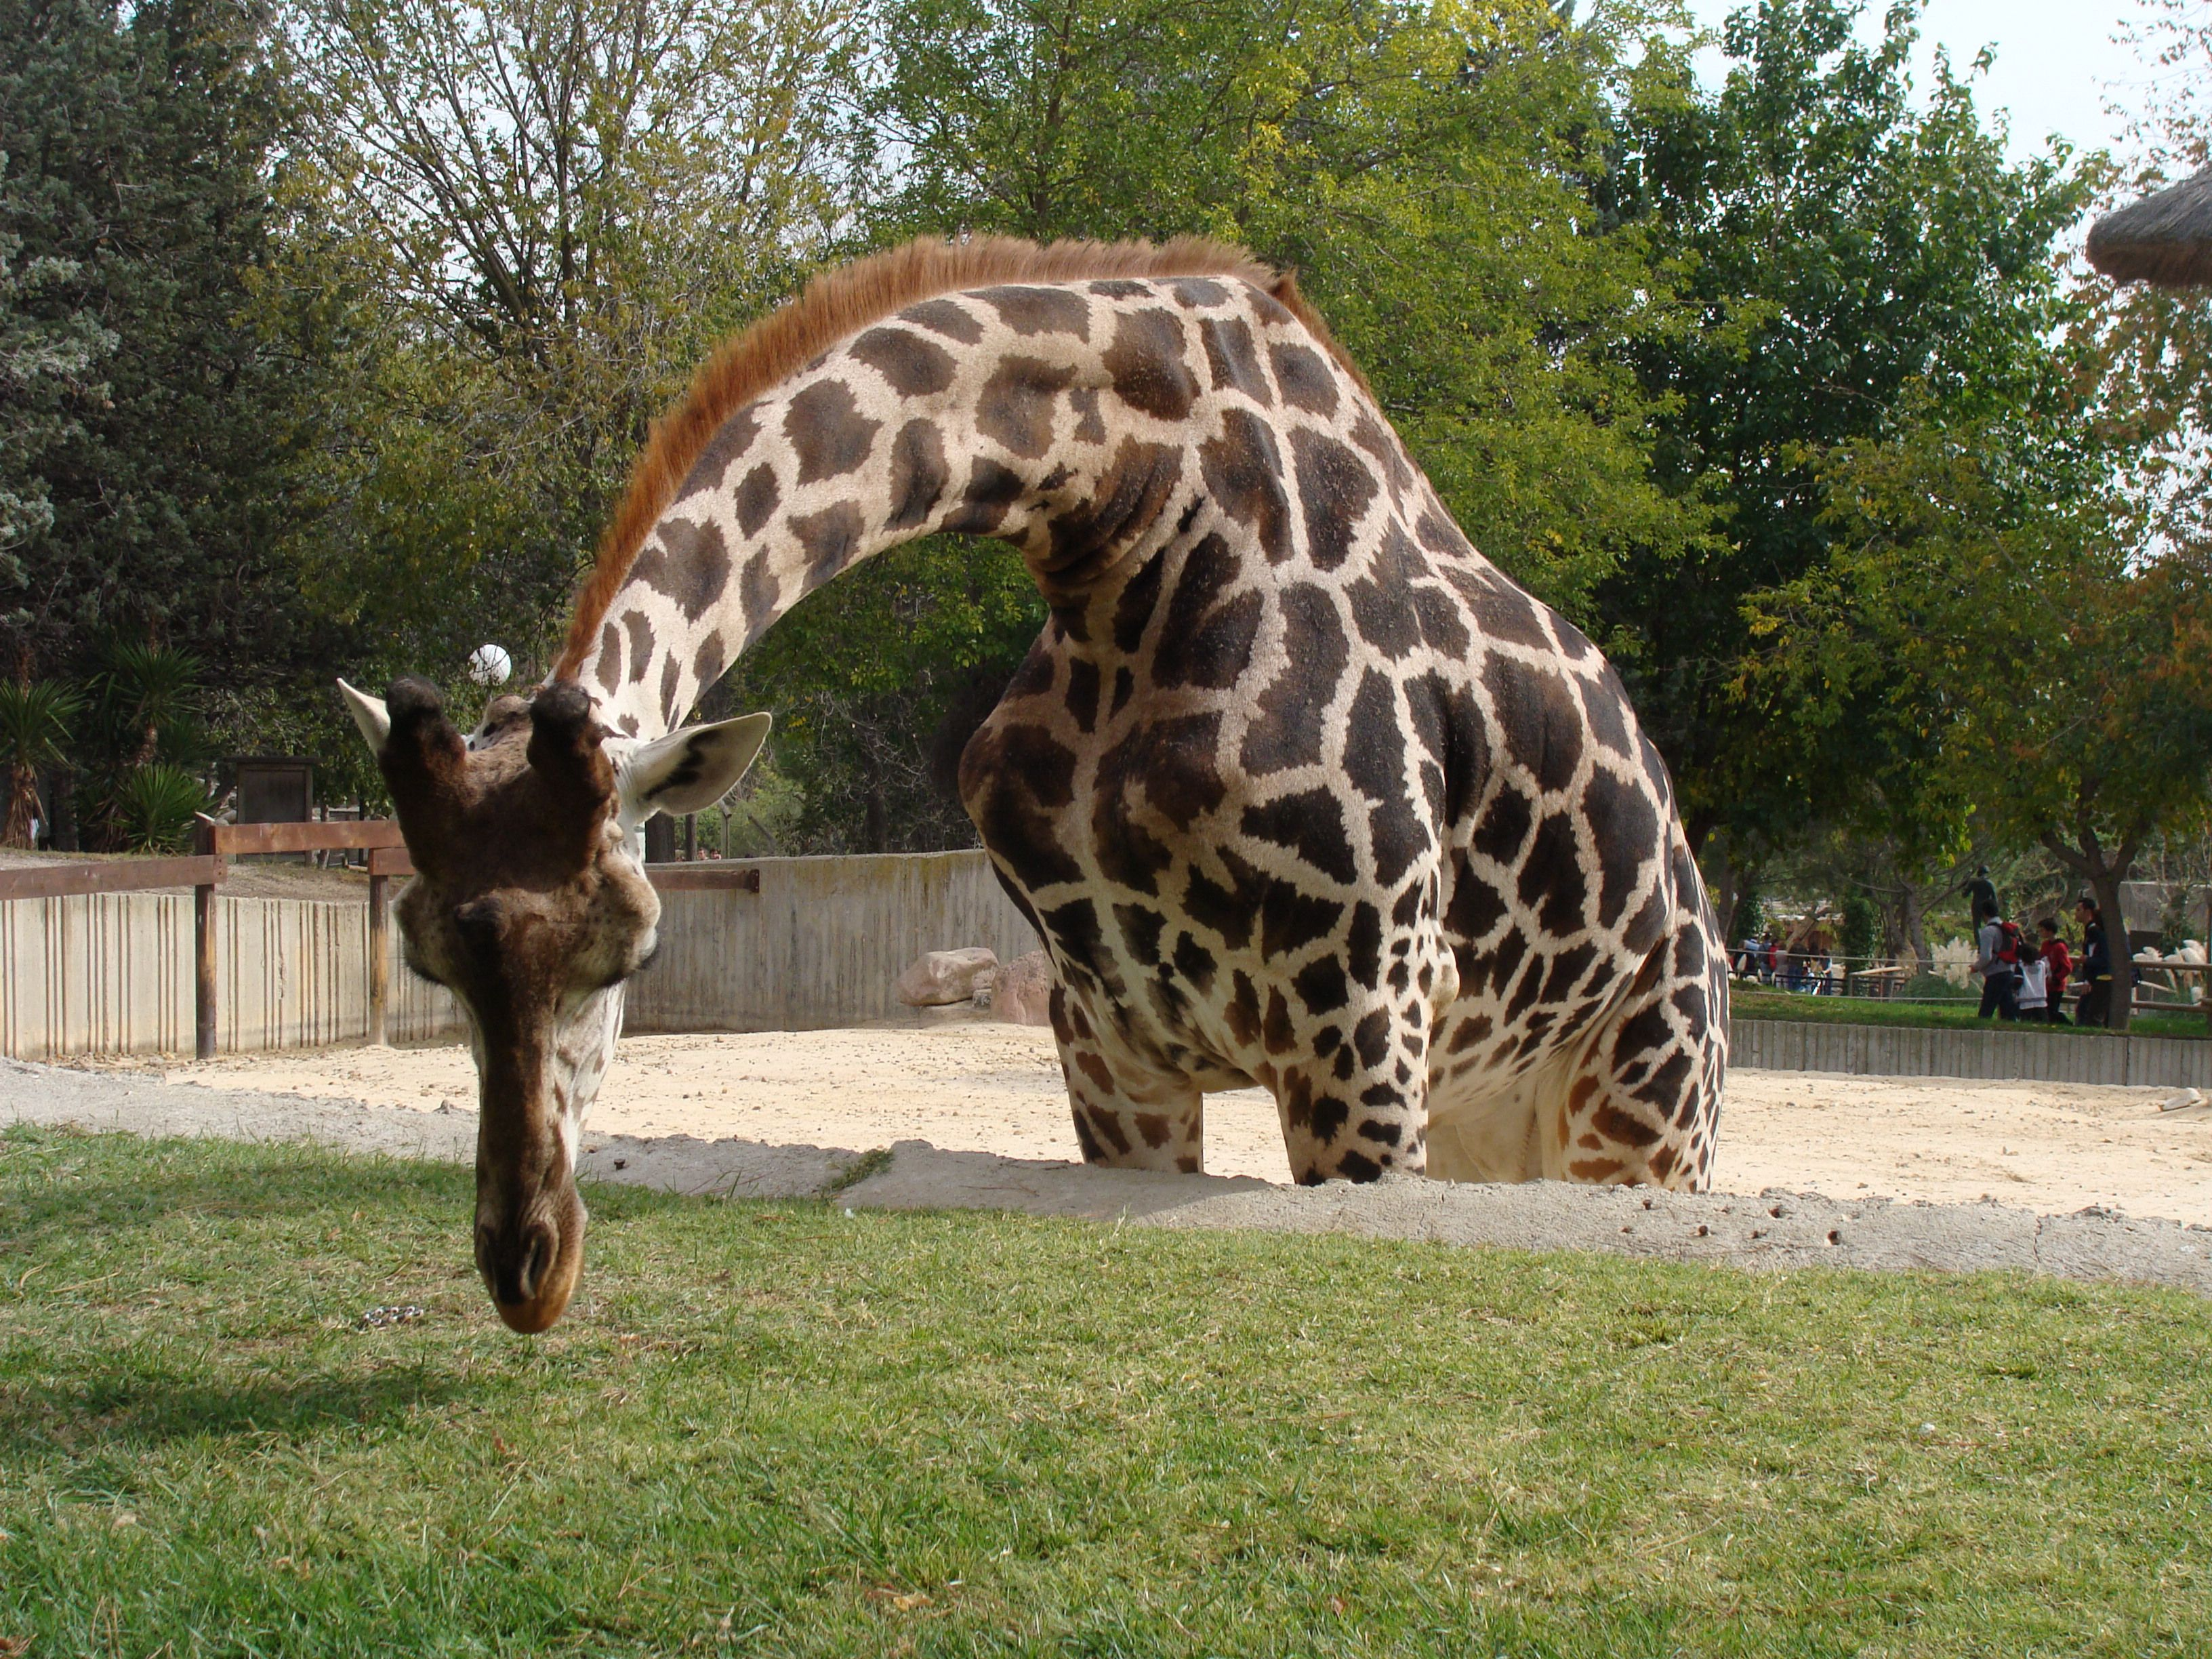 Northern giraffe in the Zoo Aquarium in Madrid, Spain